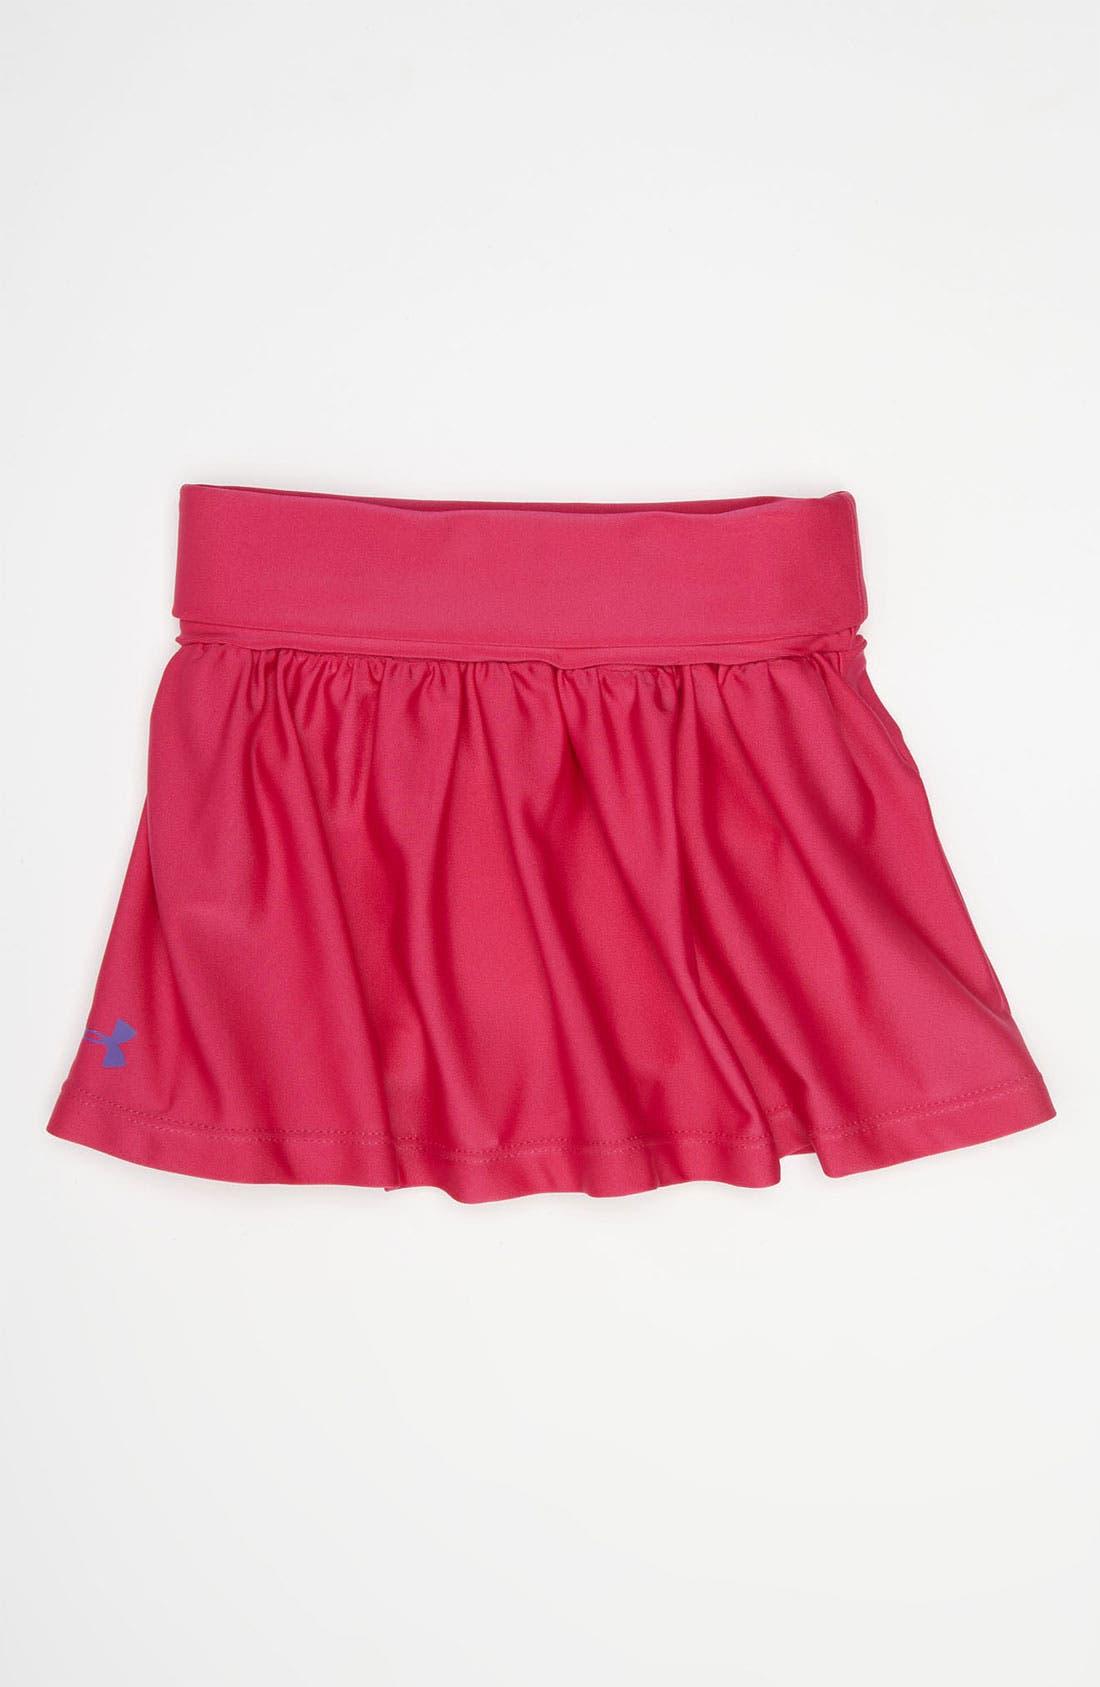 Main Image - Under Armour Tennis Skirt (Toddler)